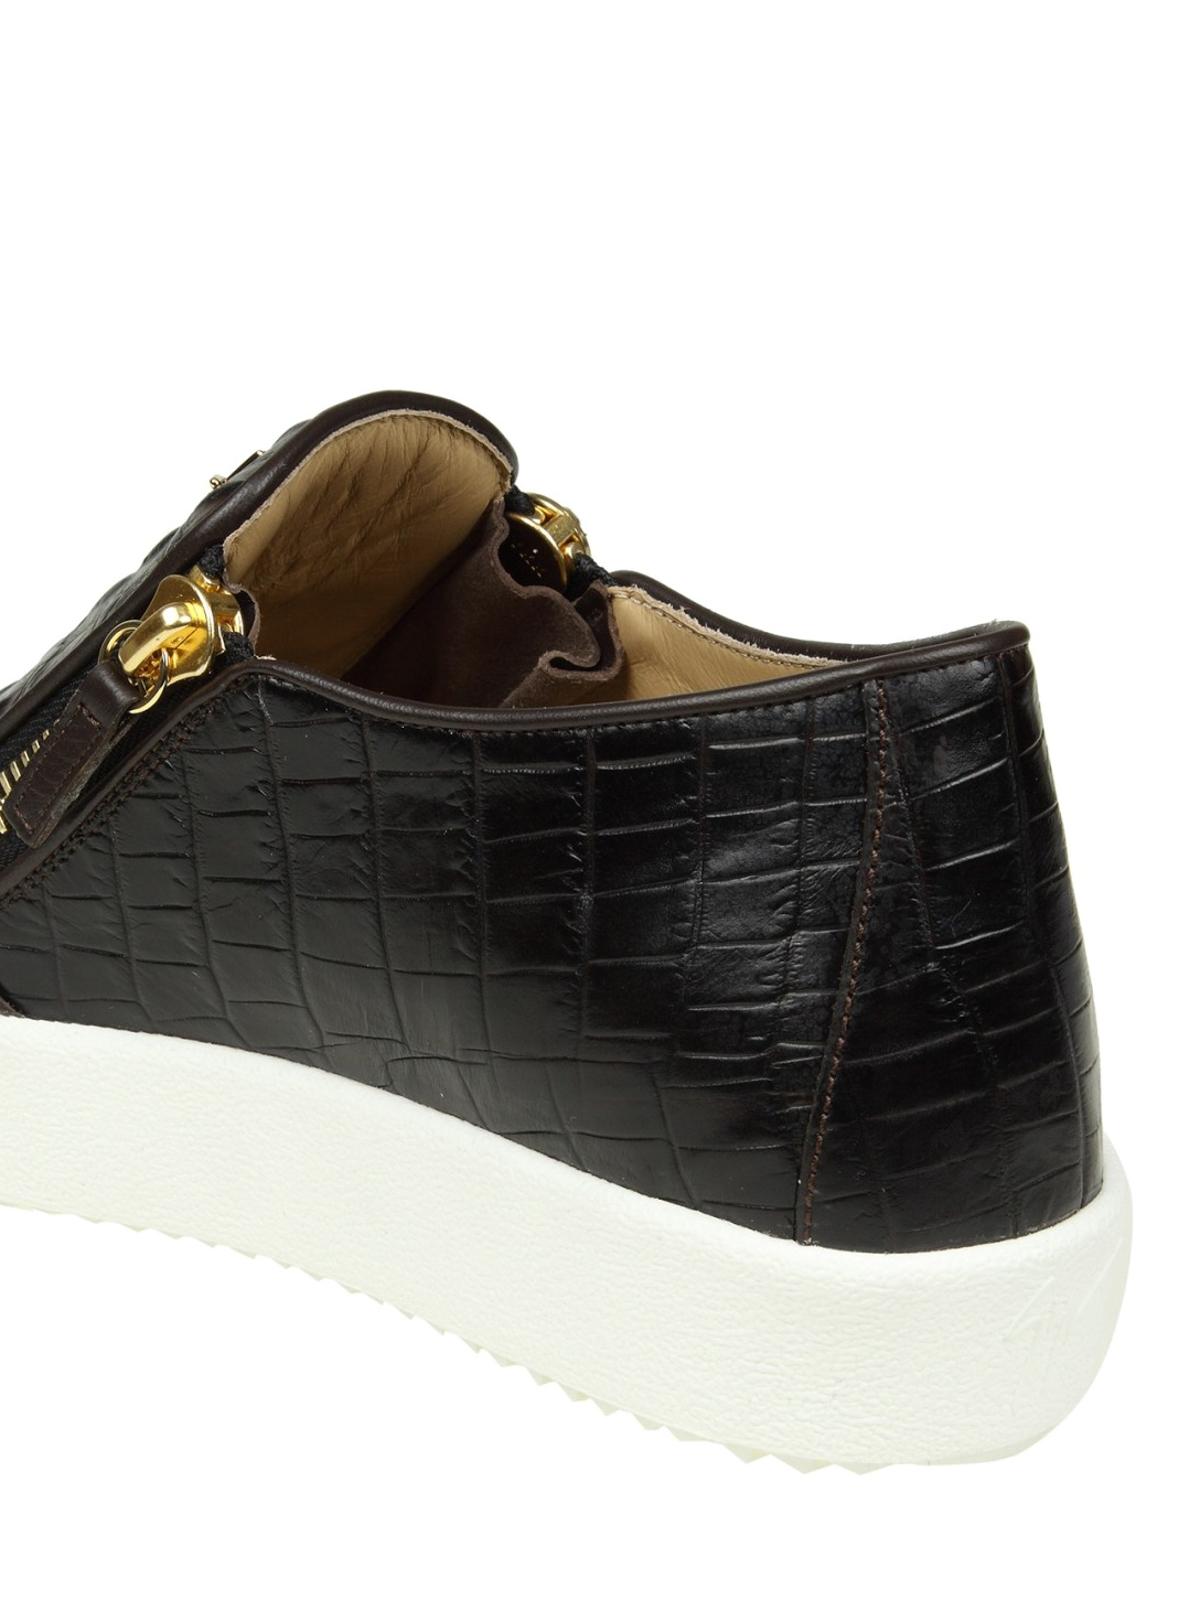 5287a0fd9f14c Giuseppe Zanotti - May London croco print slip-ons - trainers ...